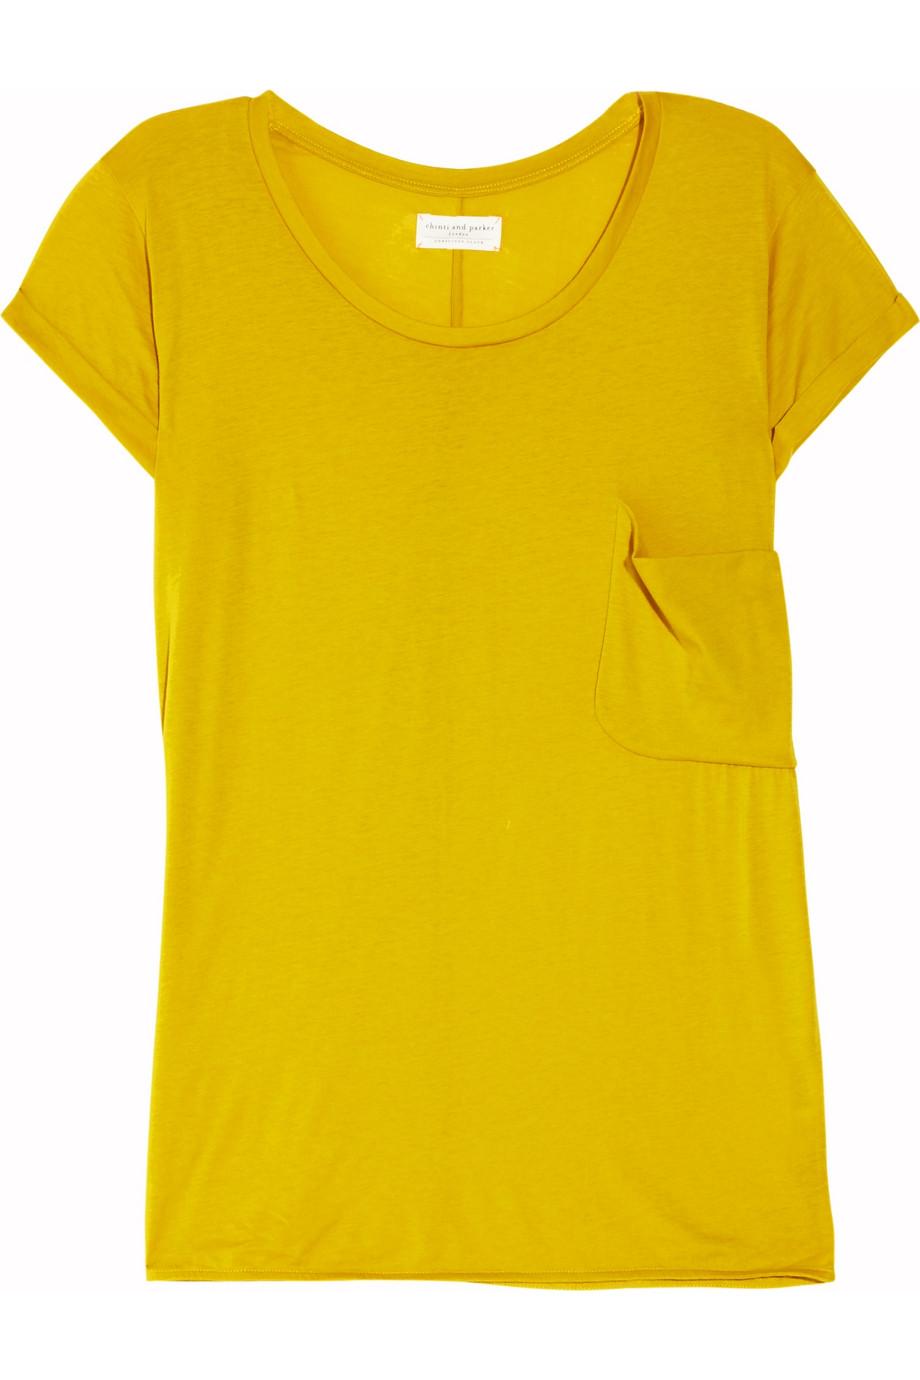 Chinti Parker Oversized Organic Cotton T Shirt In Yellow